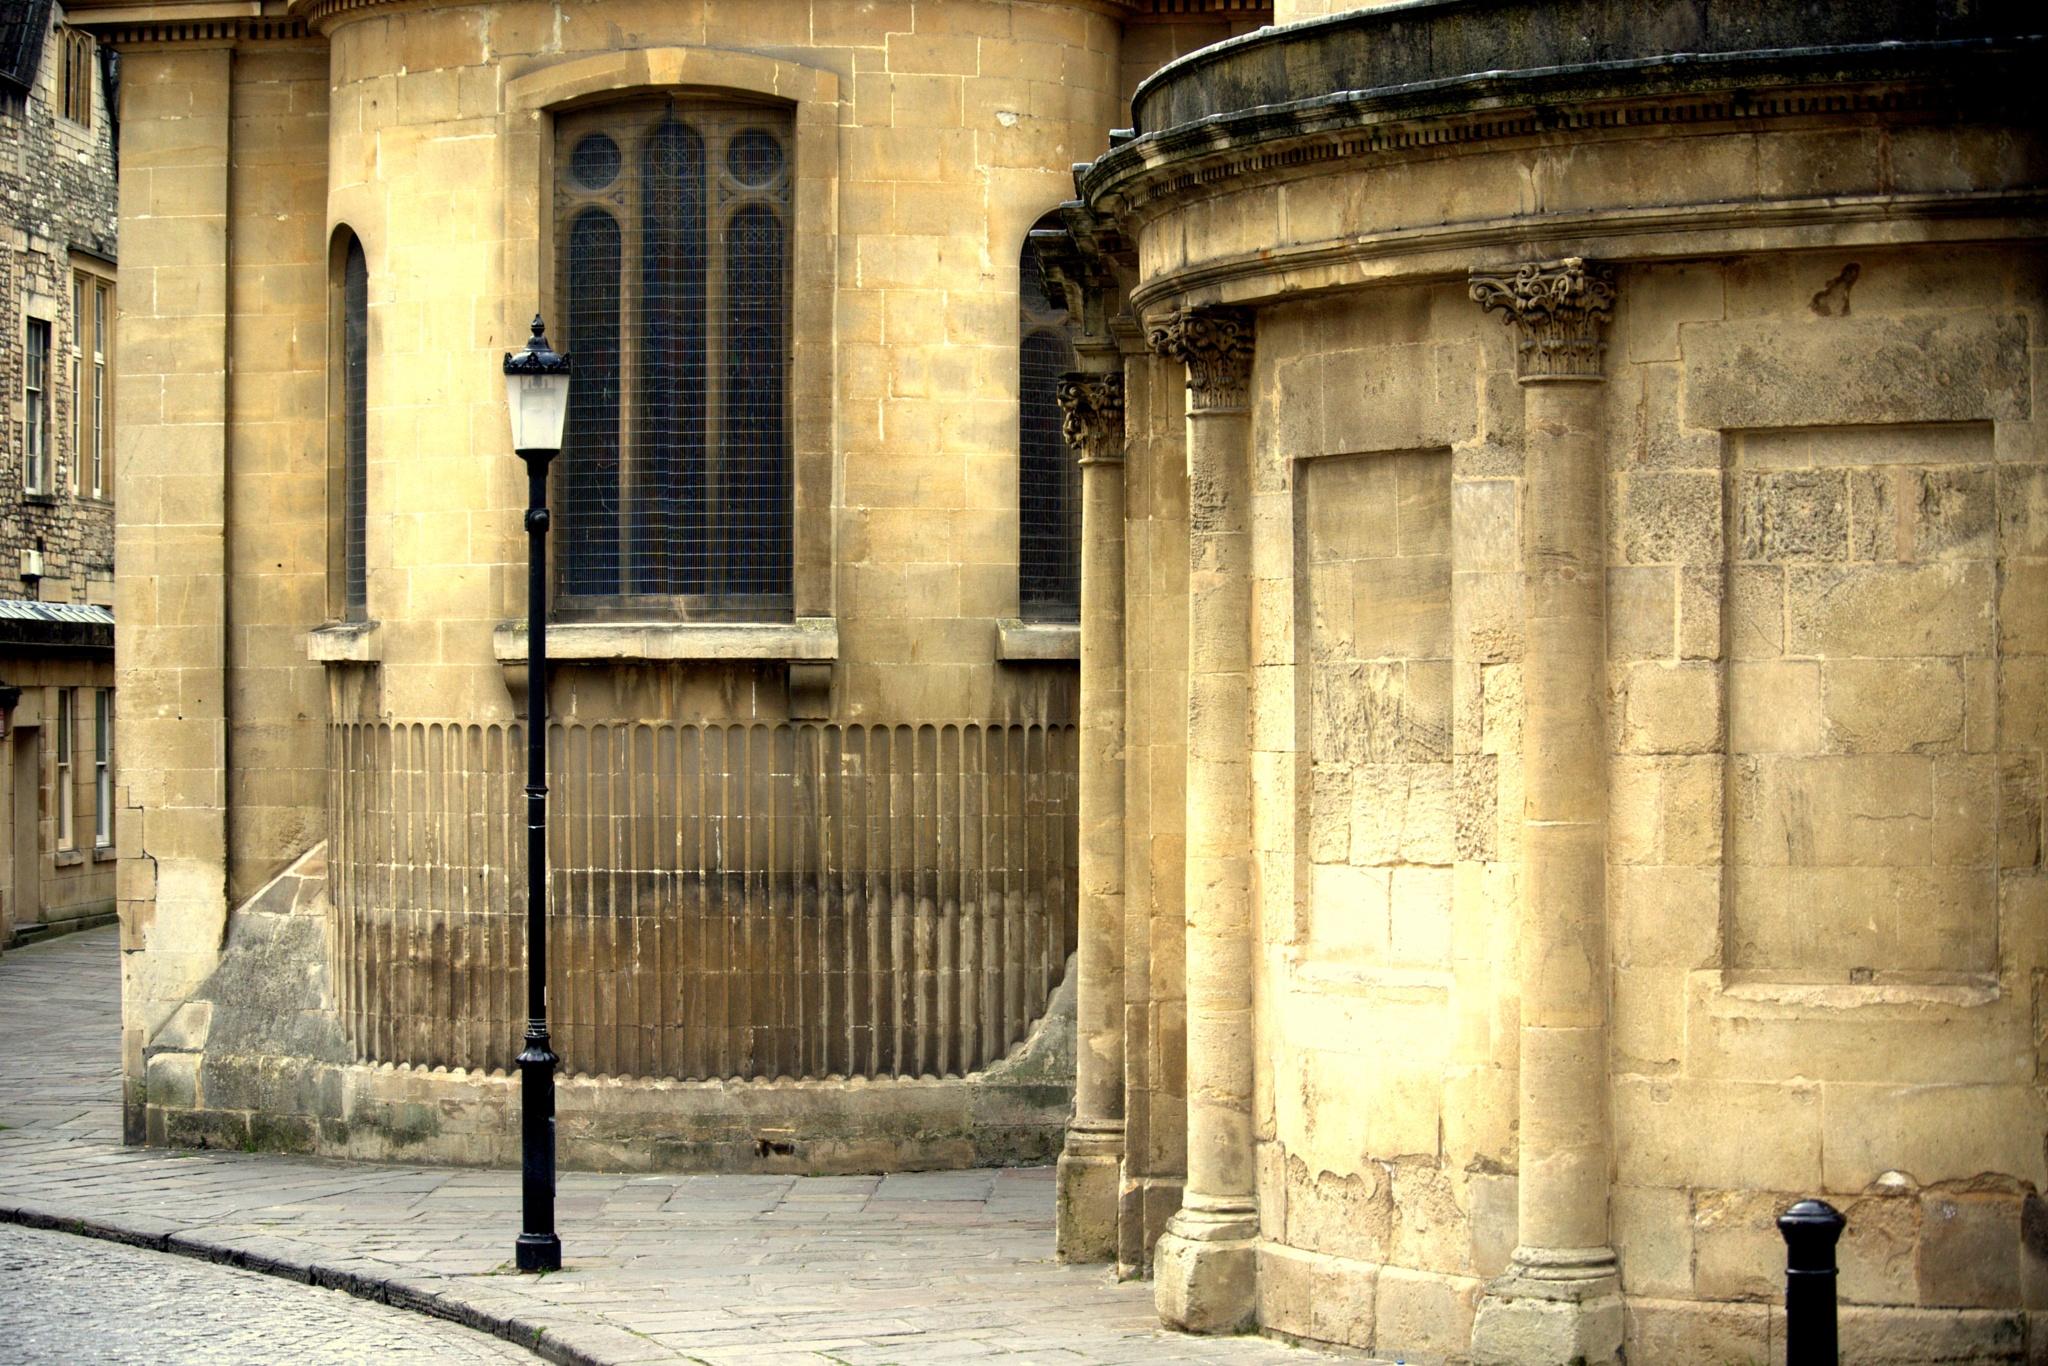 Quiet moment in Bath by Debra Kurs